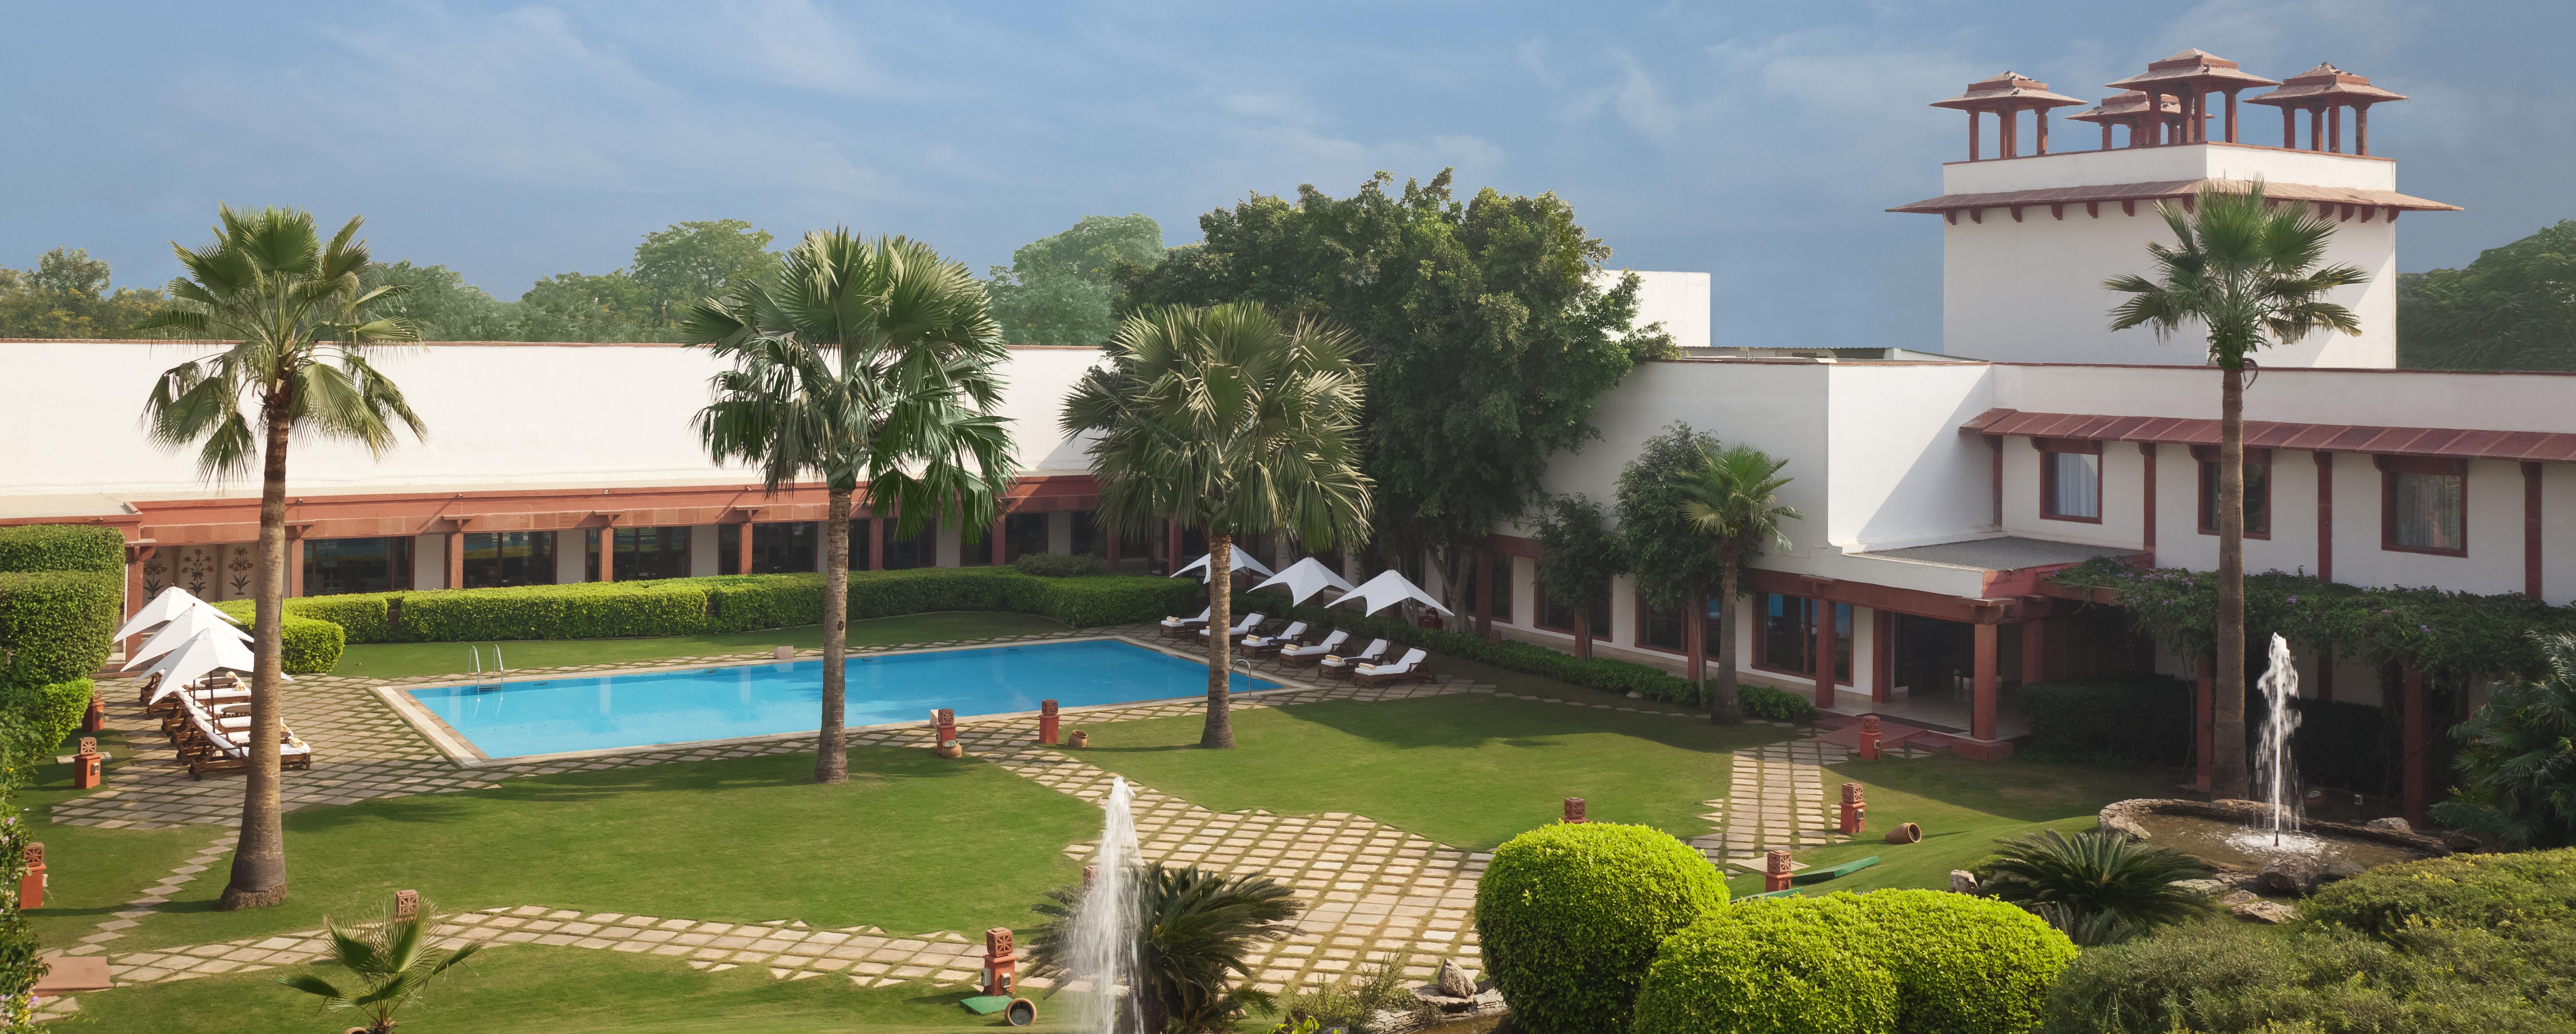 trident-hotel-agra-india